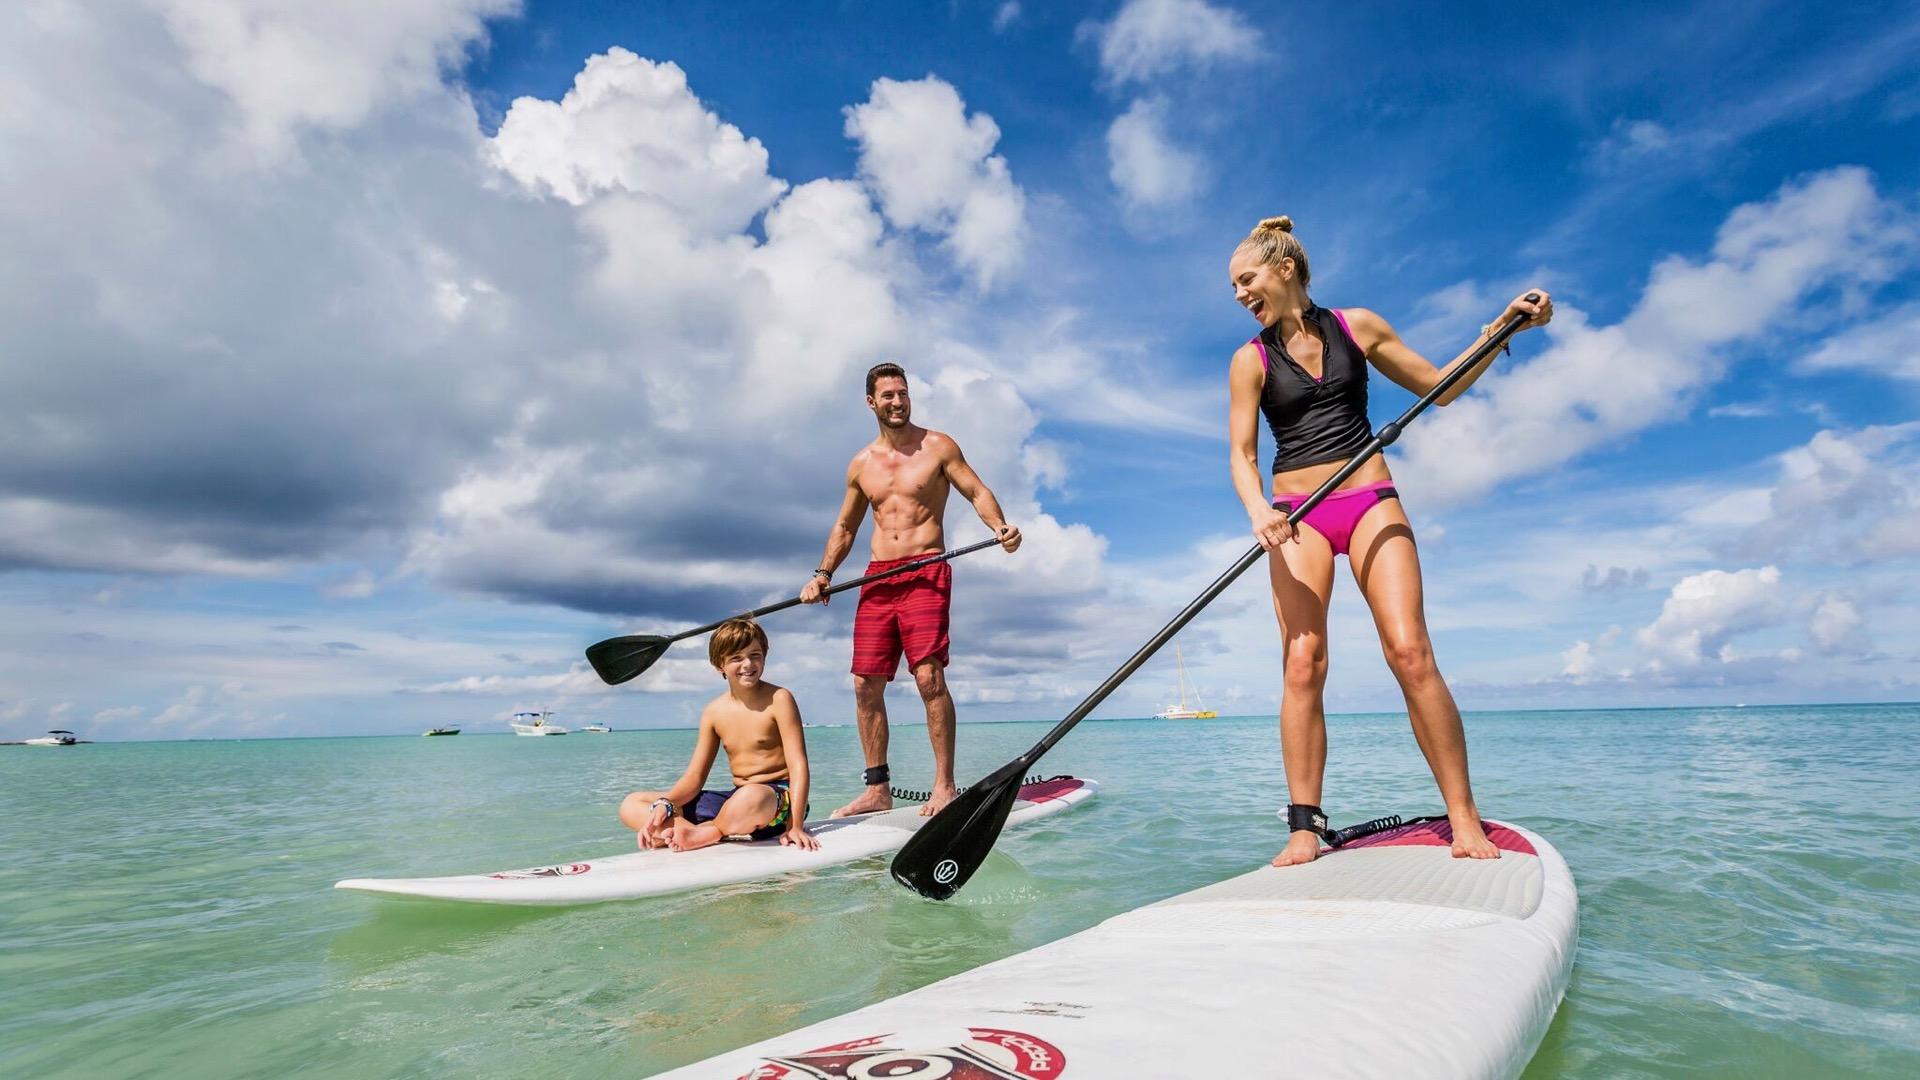 Caribbean. Hilton Aruba, Healthy Living + Travel